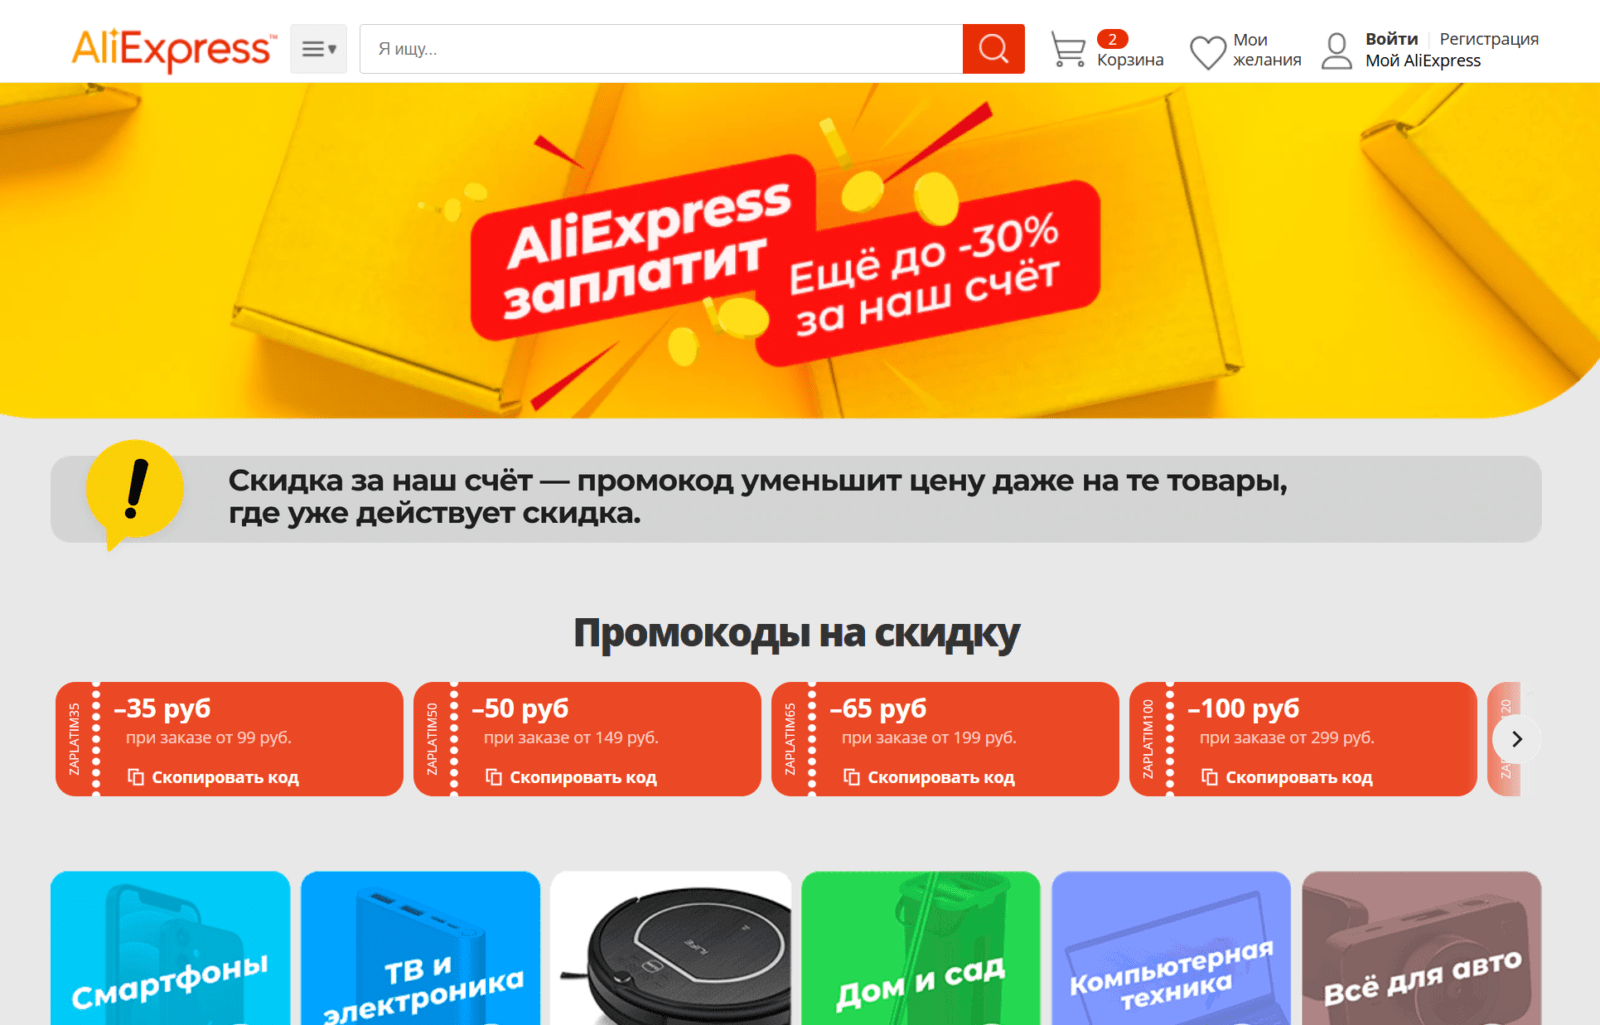 [Распродажа] AliExpress заплатит